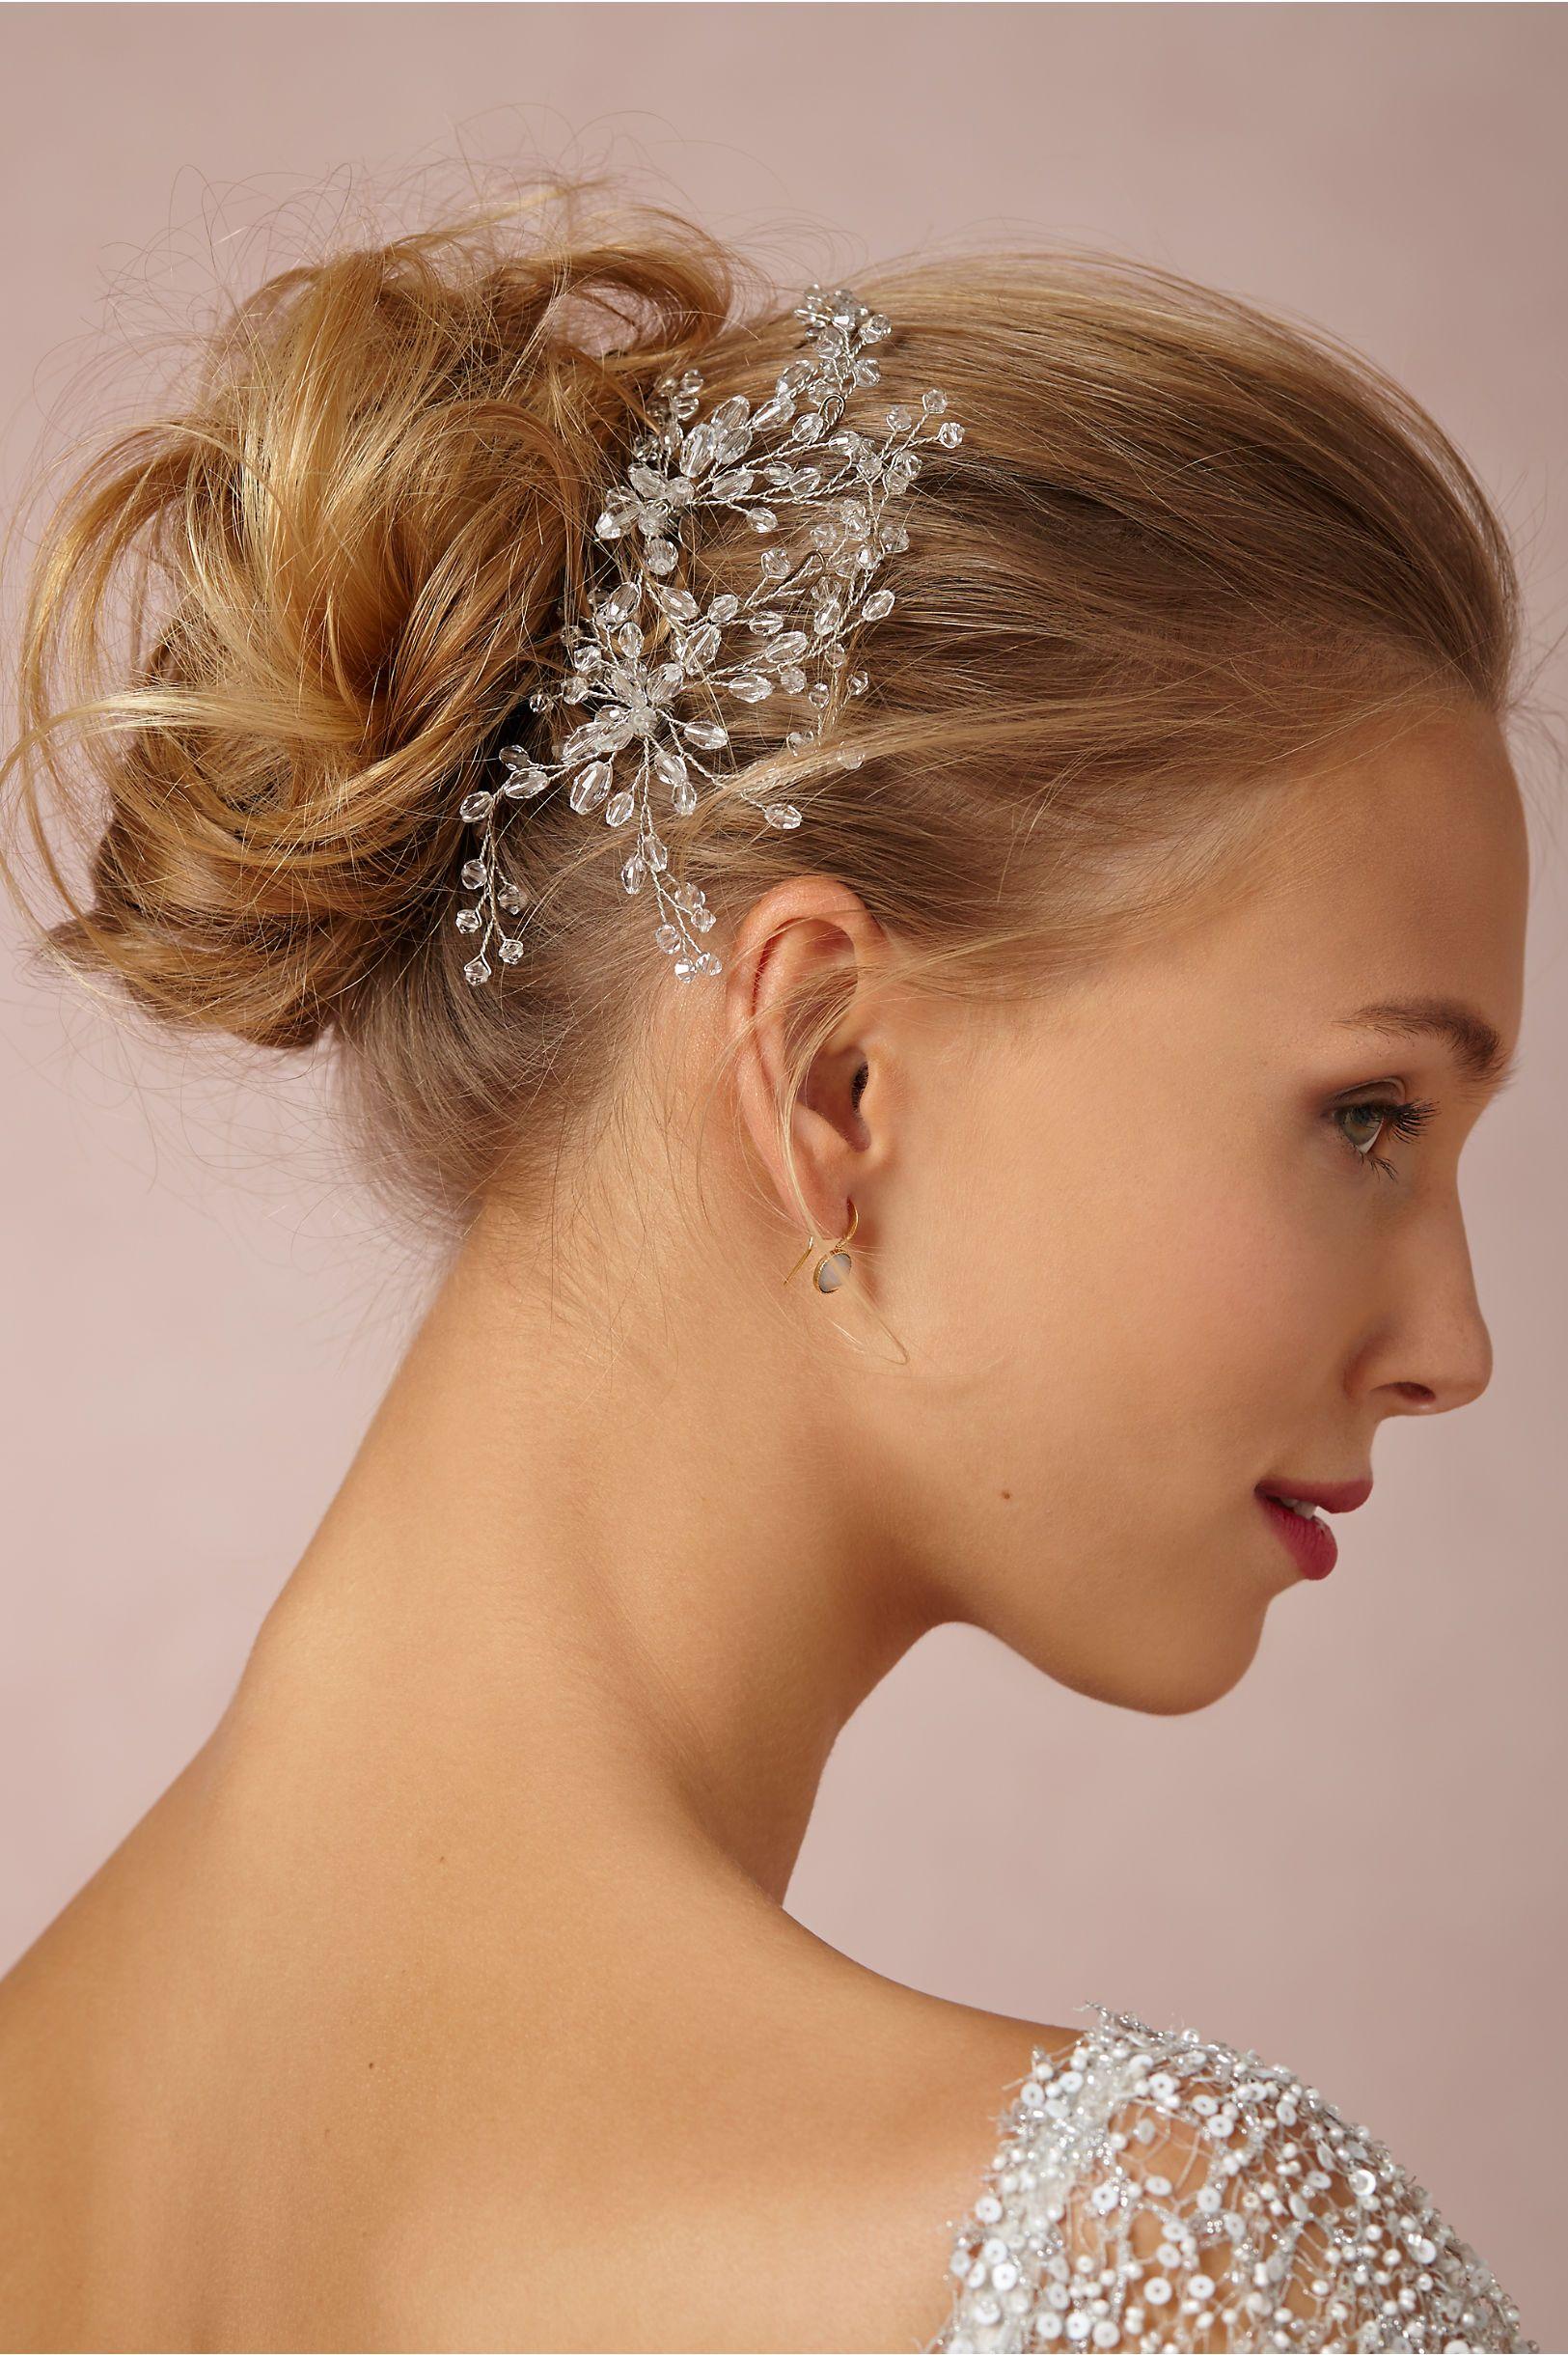 Dewed Vines Hairpin Wedding Hair Accessories Hair Pins Bridal